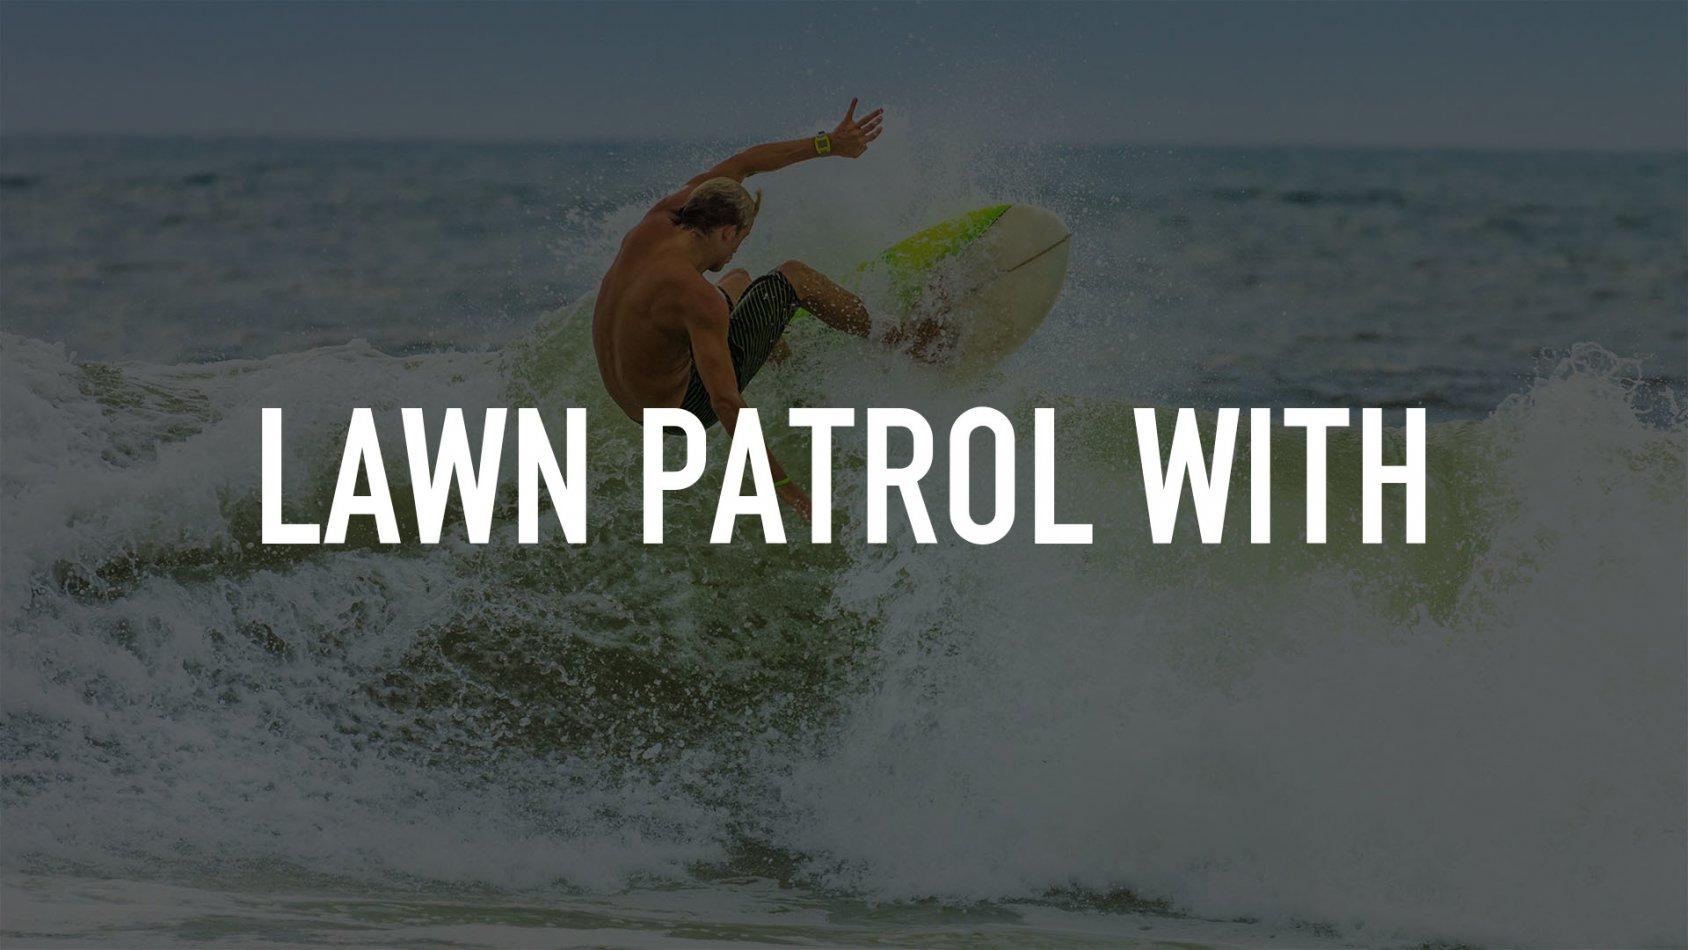 Lawn Patrol with